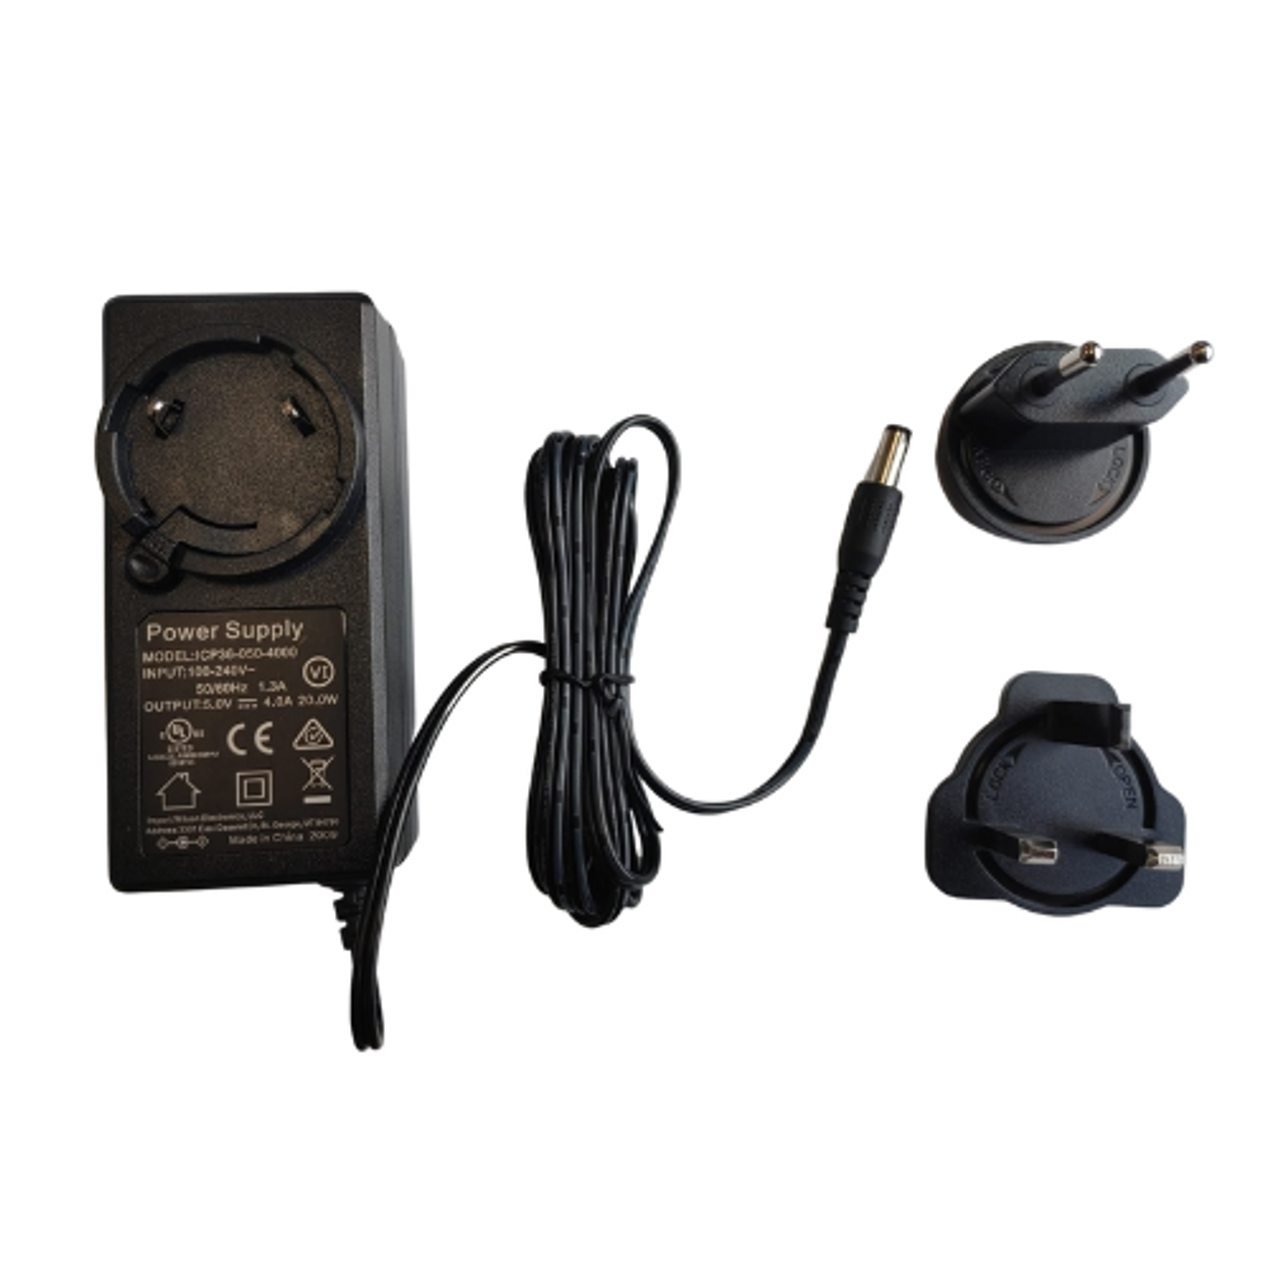 5V 4A Power Supply